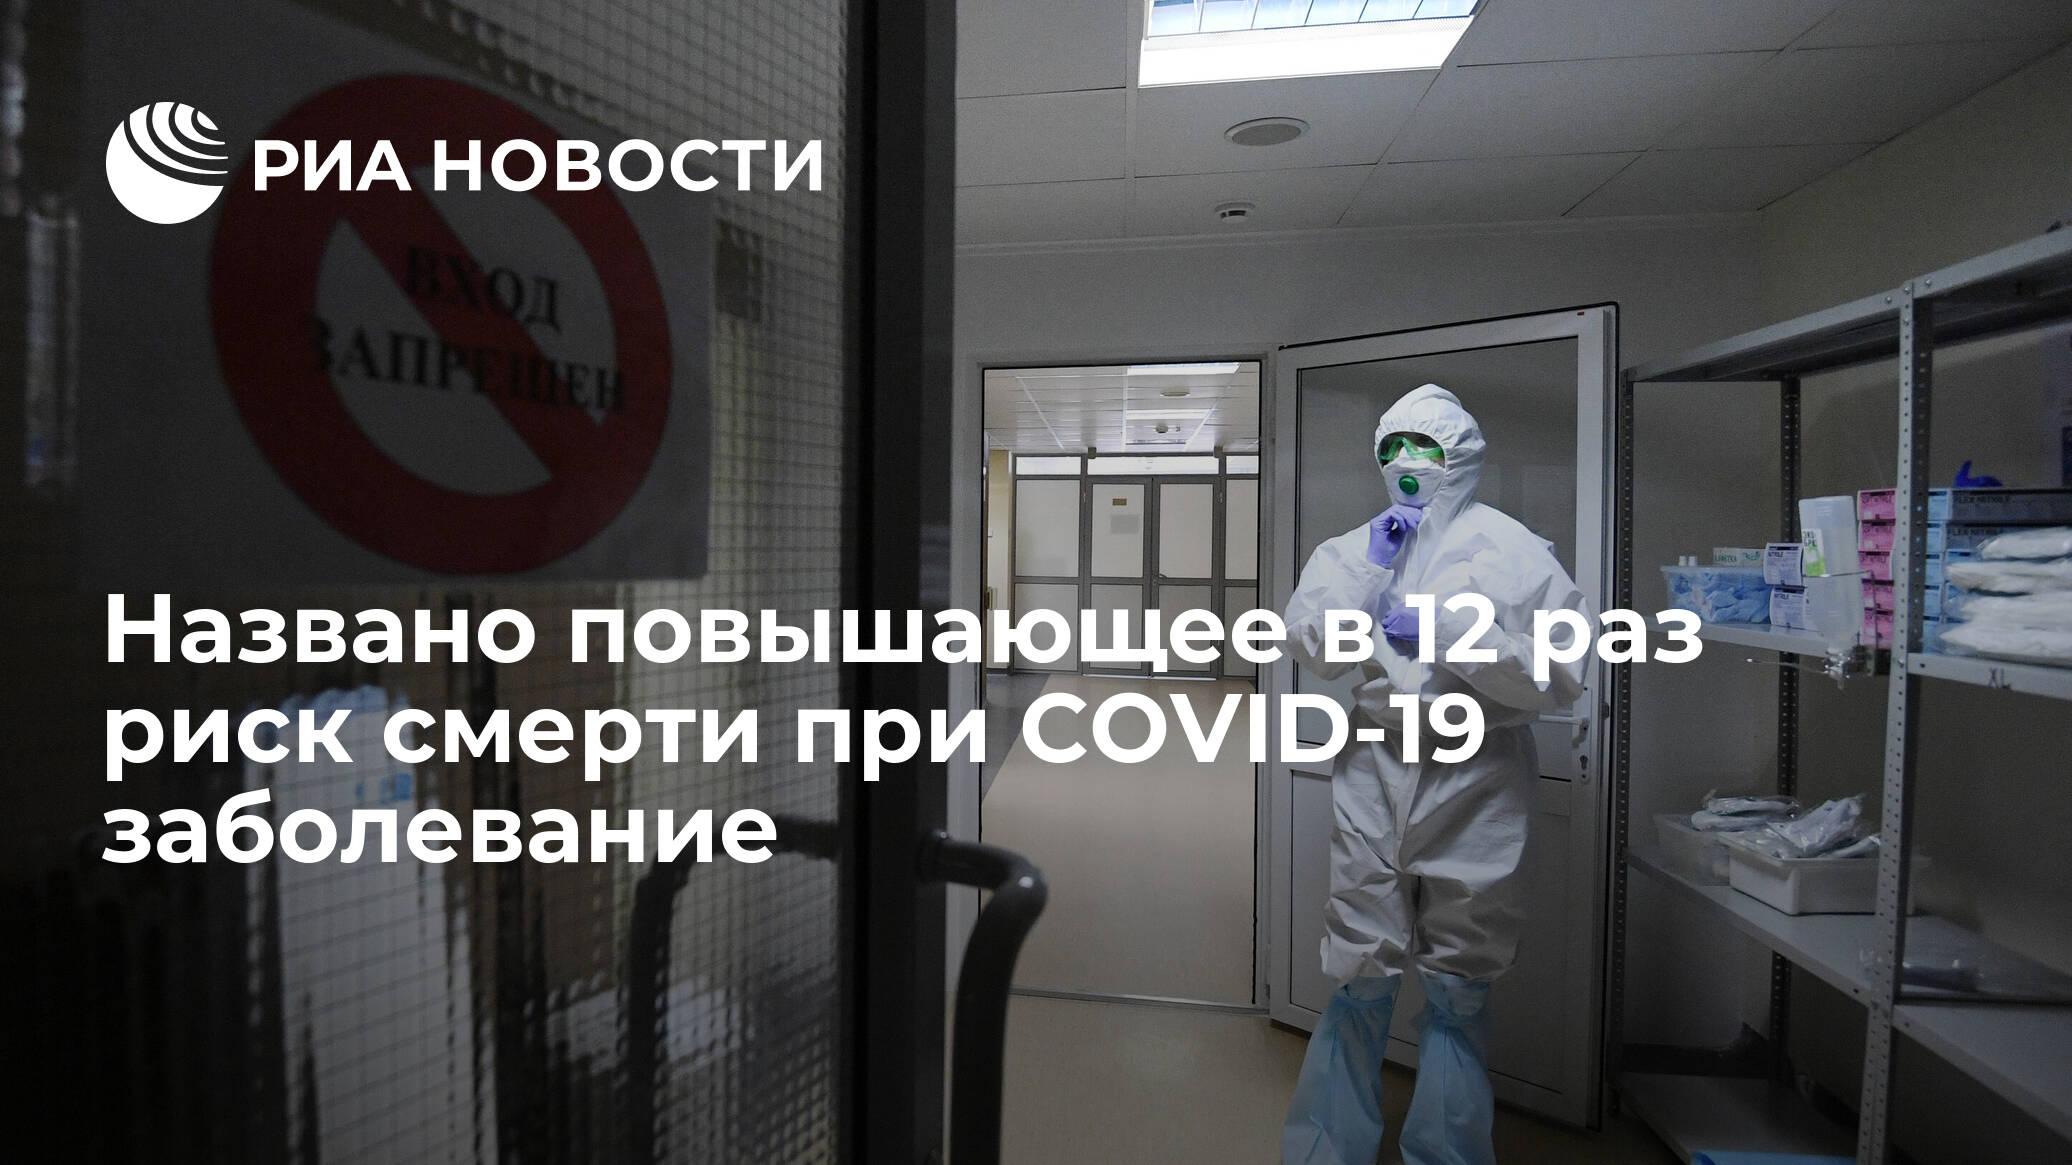 Названо заболевание, повышающее риск смерти при коронавирусе в 12 раз